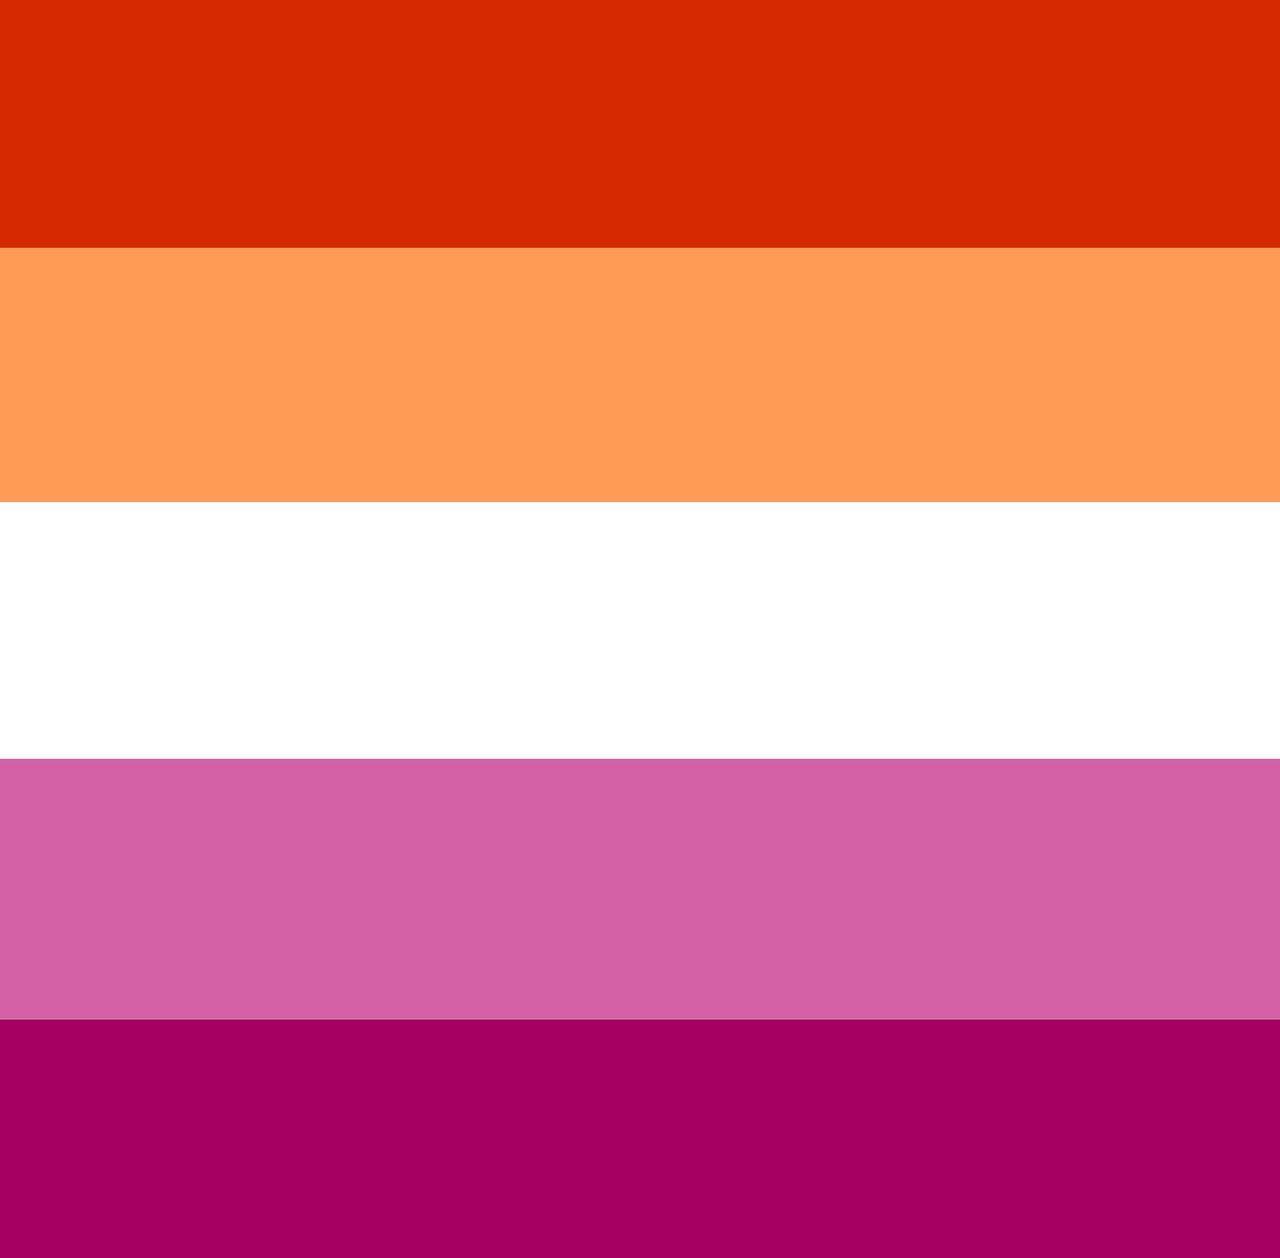 New Lesbian Flag Horizontal By Lunathewereauk On Deviantart Lesbian Flag Pride Flags Lesbian Pride